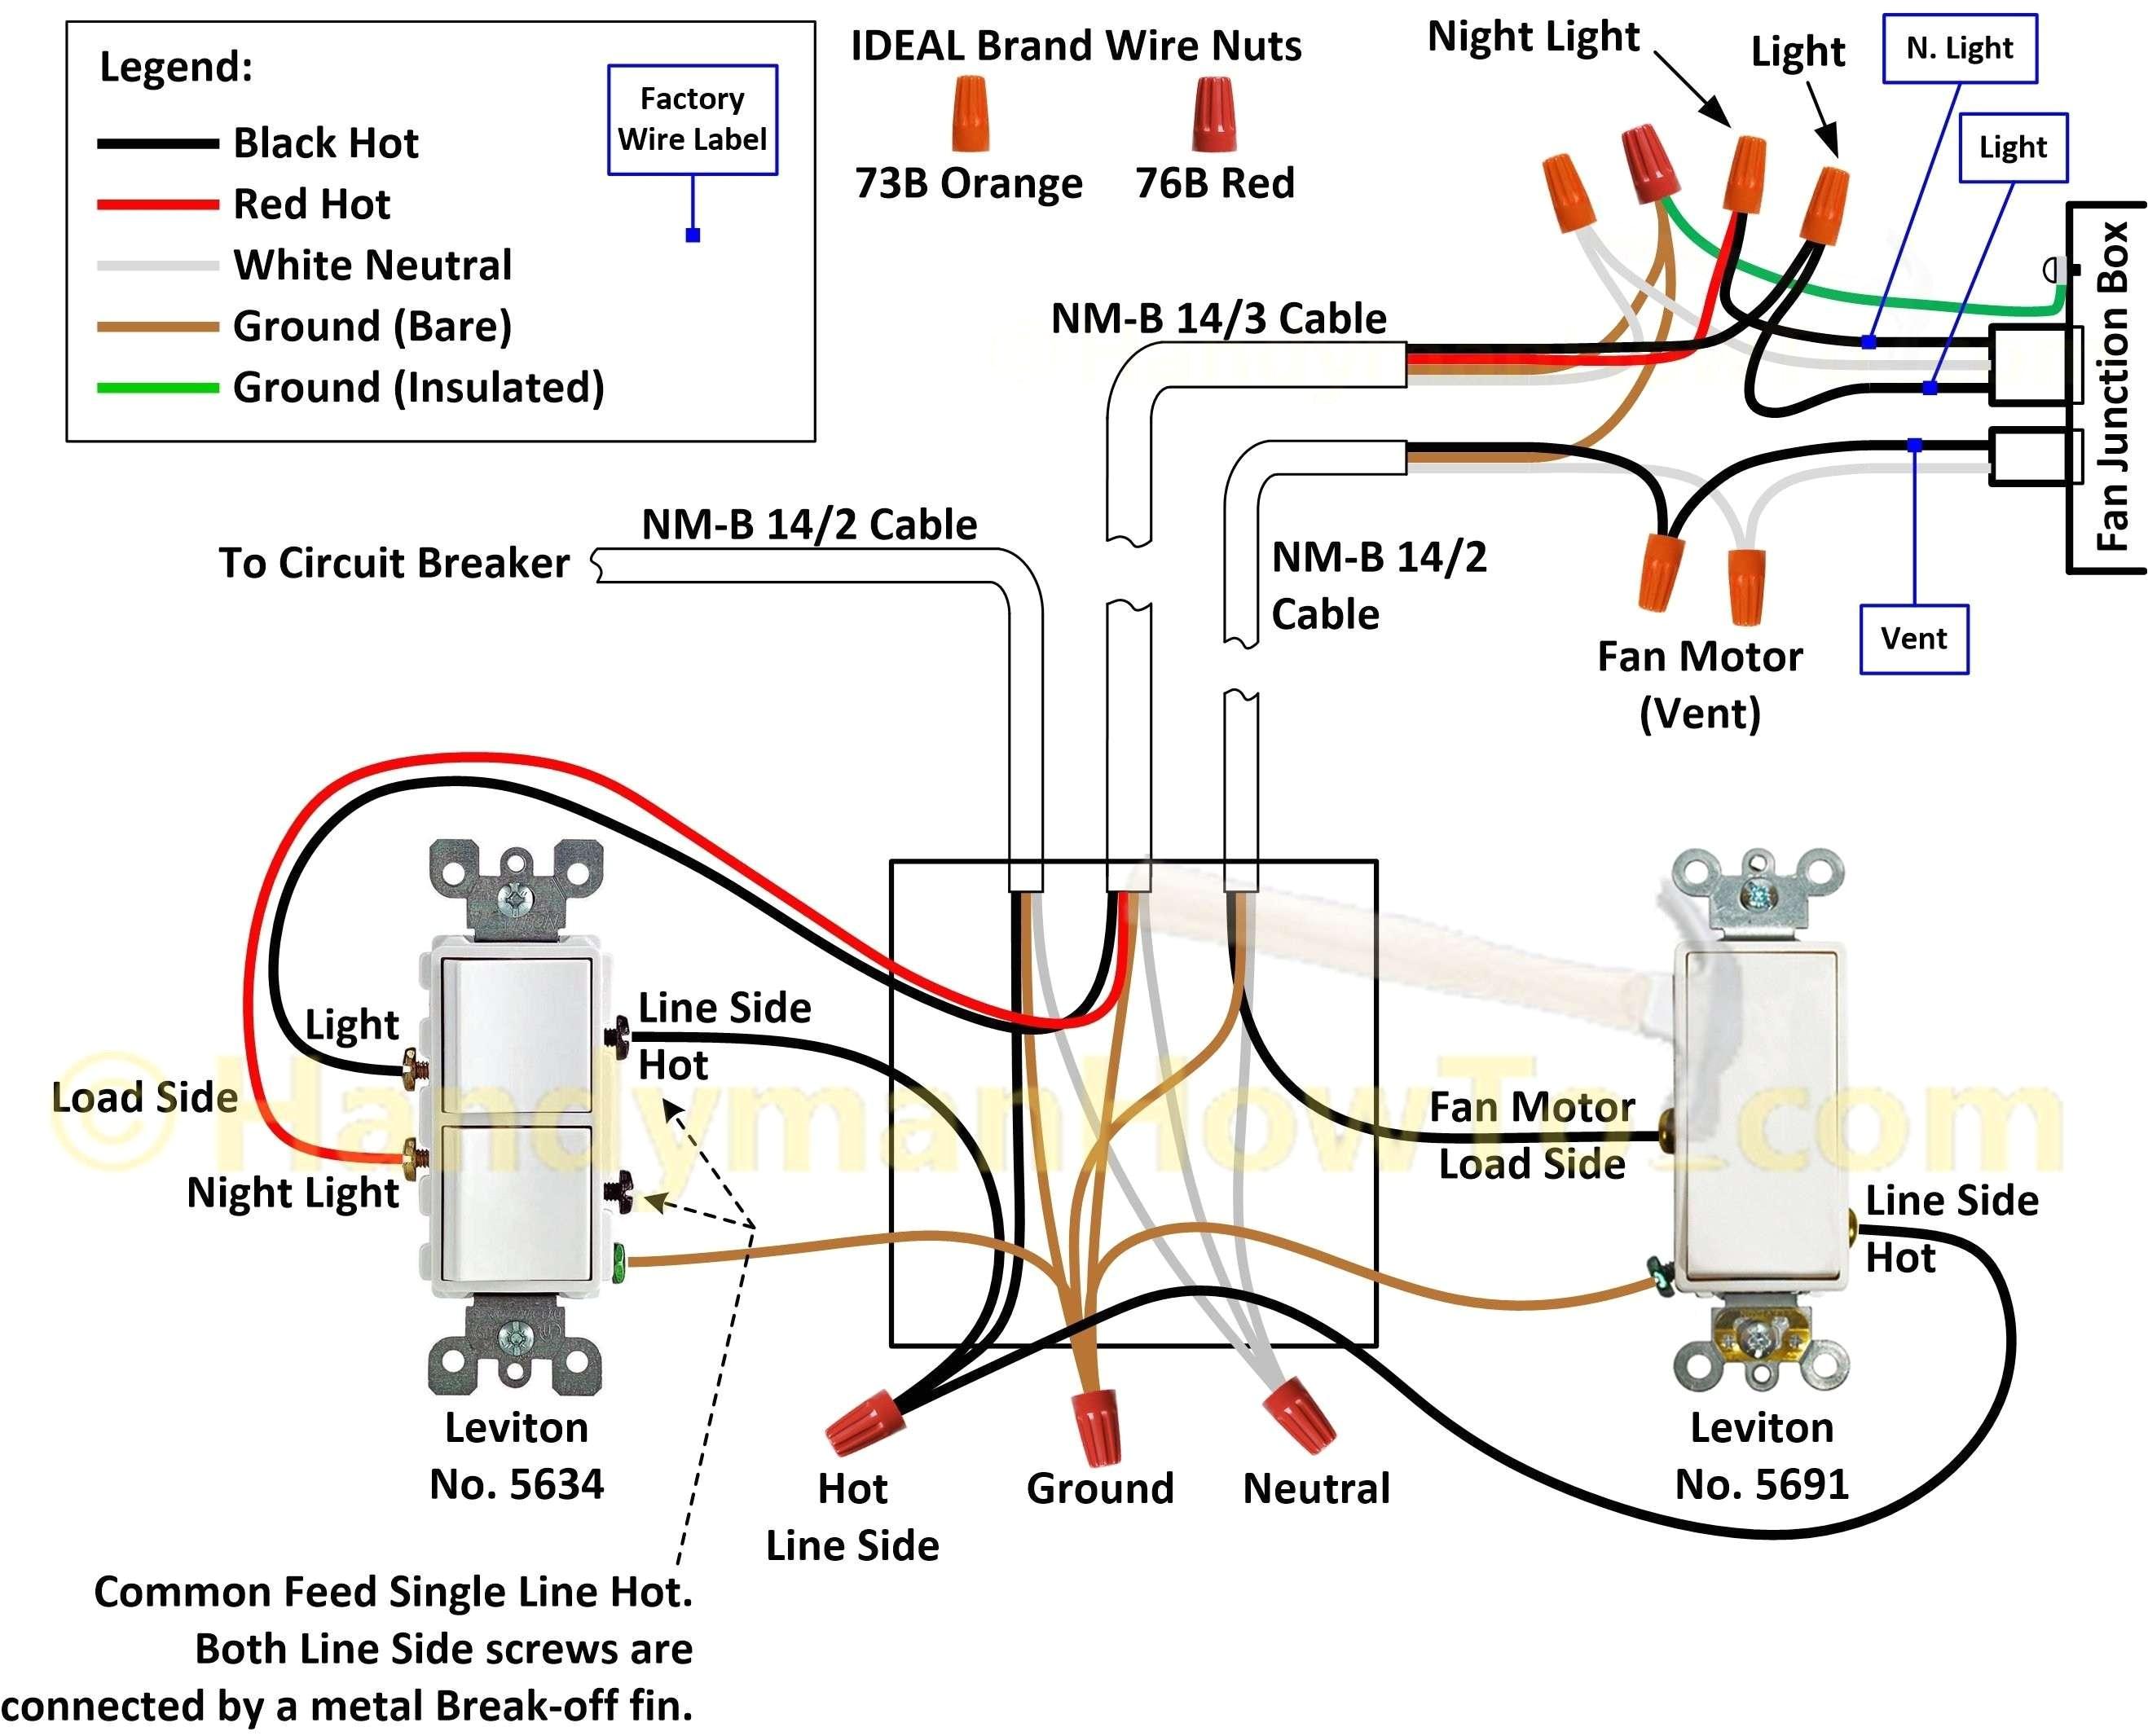 Wiring Diagram for Motor Pentair Pool Light Wiring Diagram New Hardware Diagram 0d Archives